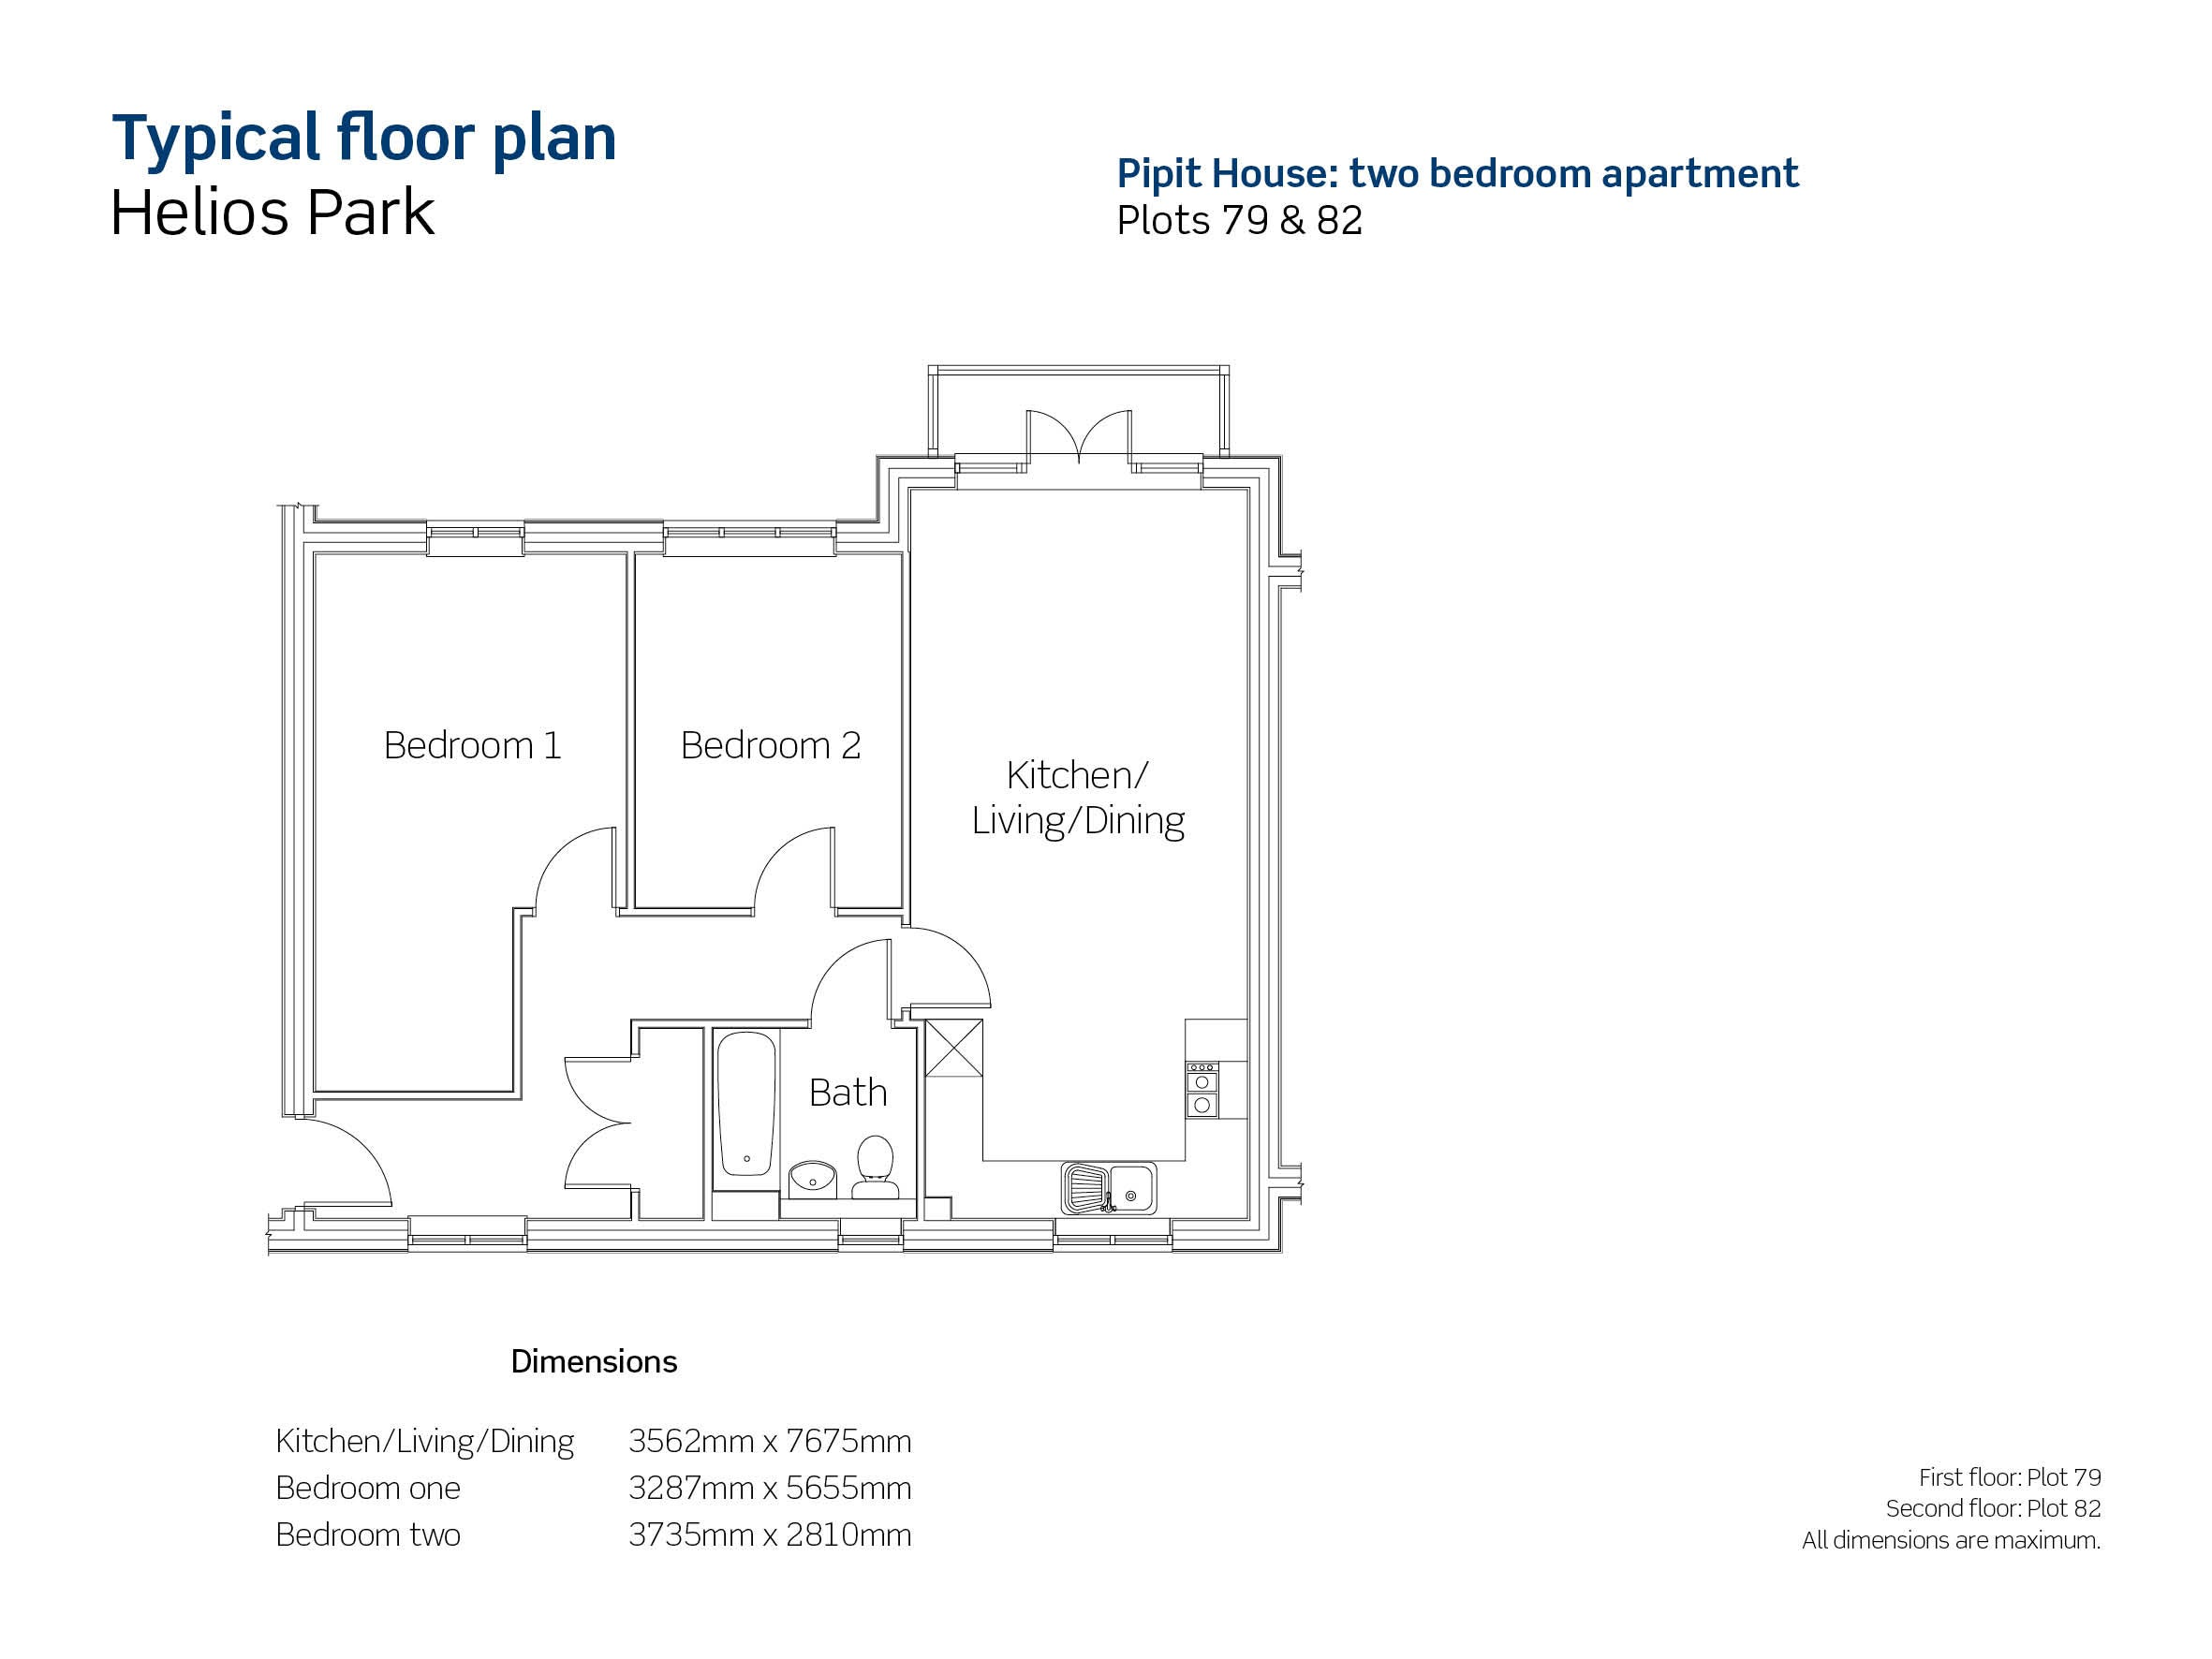 Helios Park plots 79 & 82 floor plan